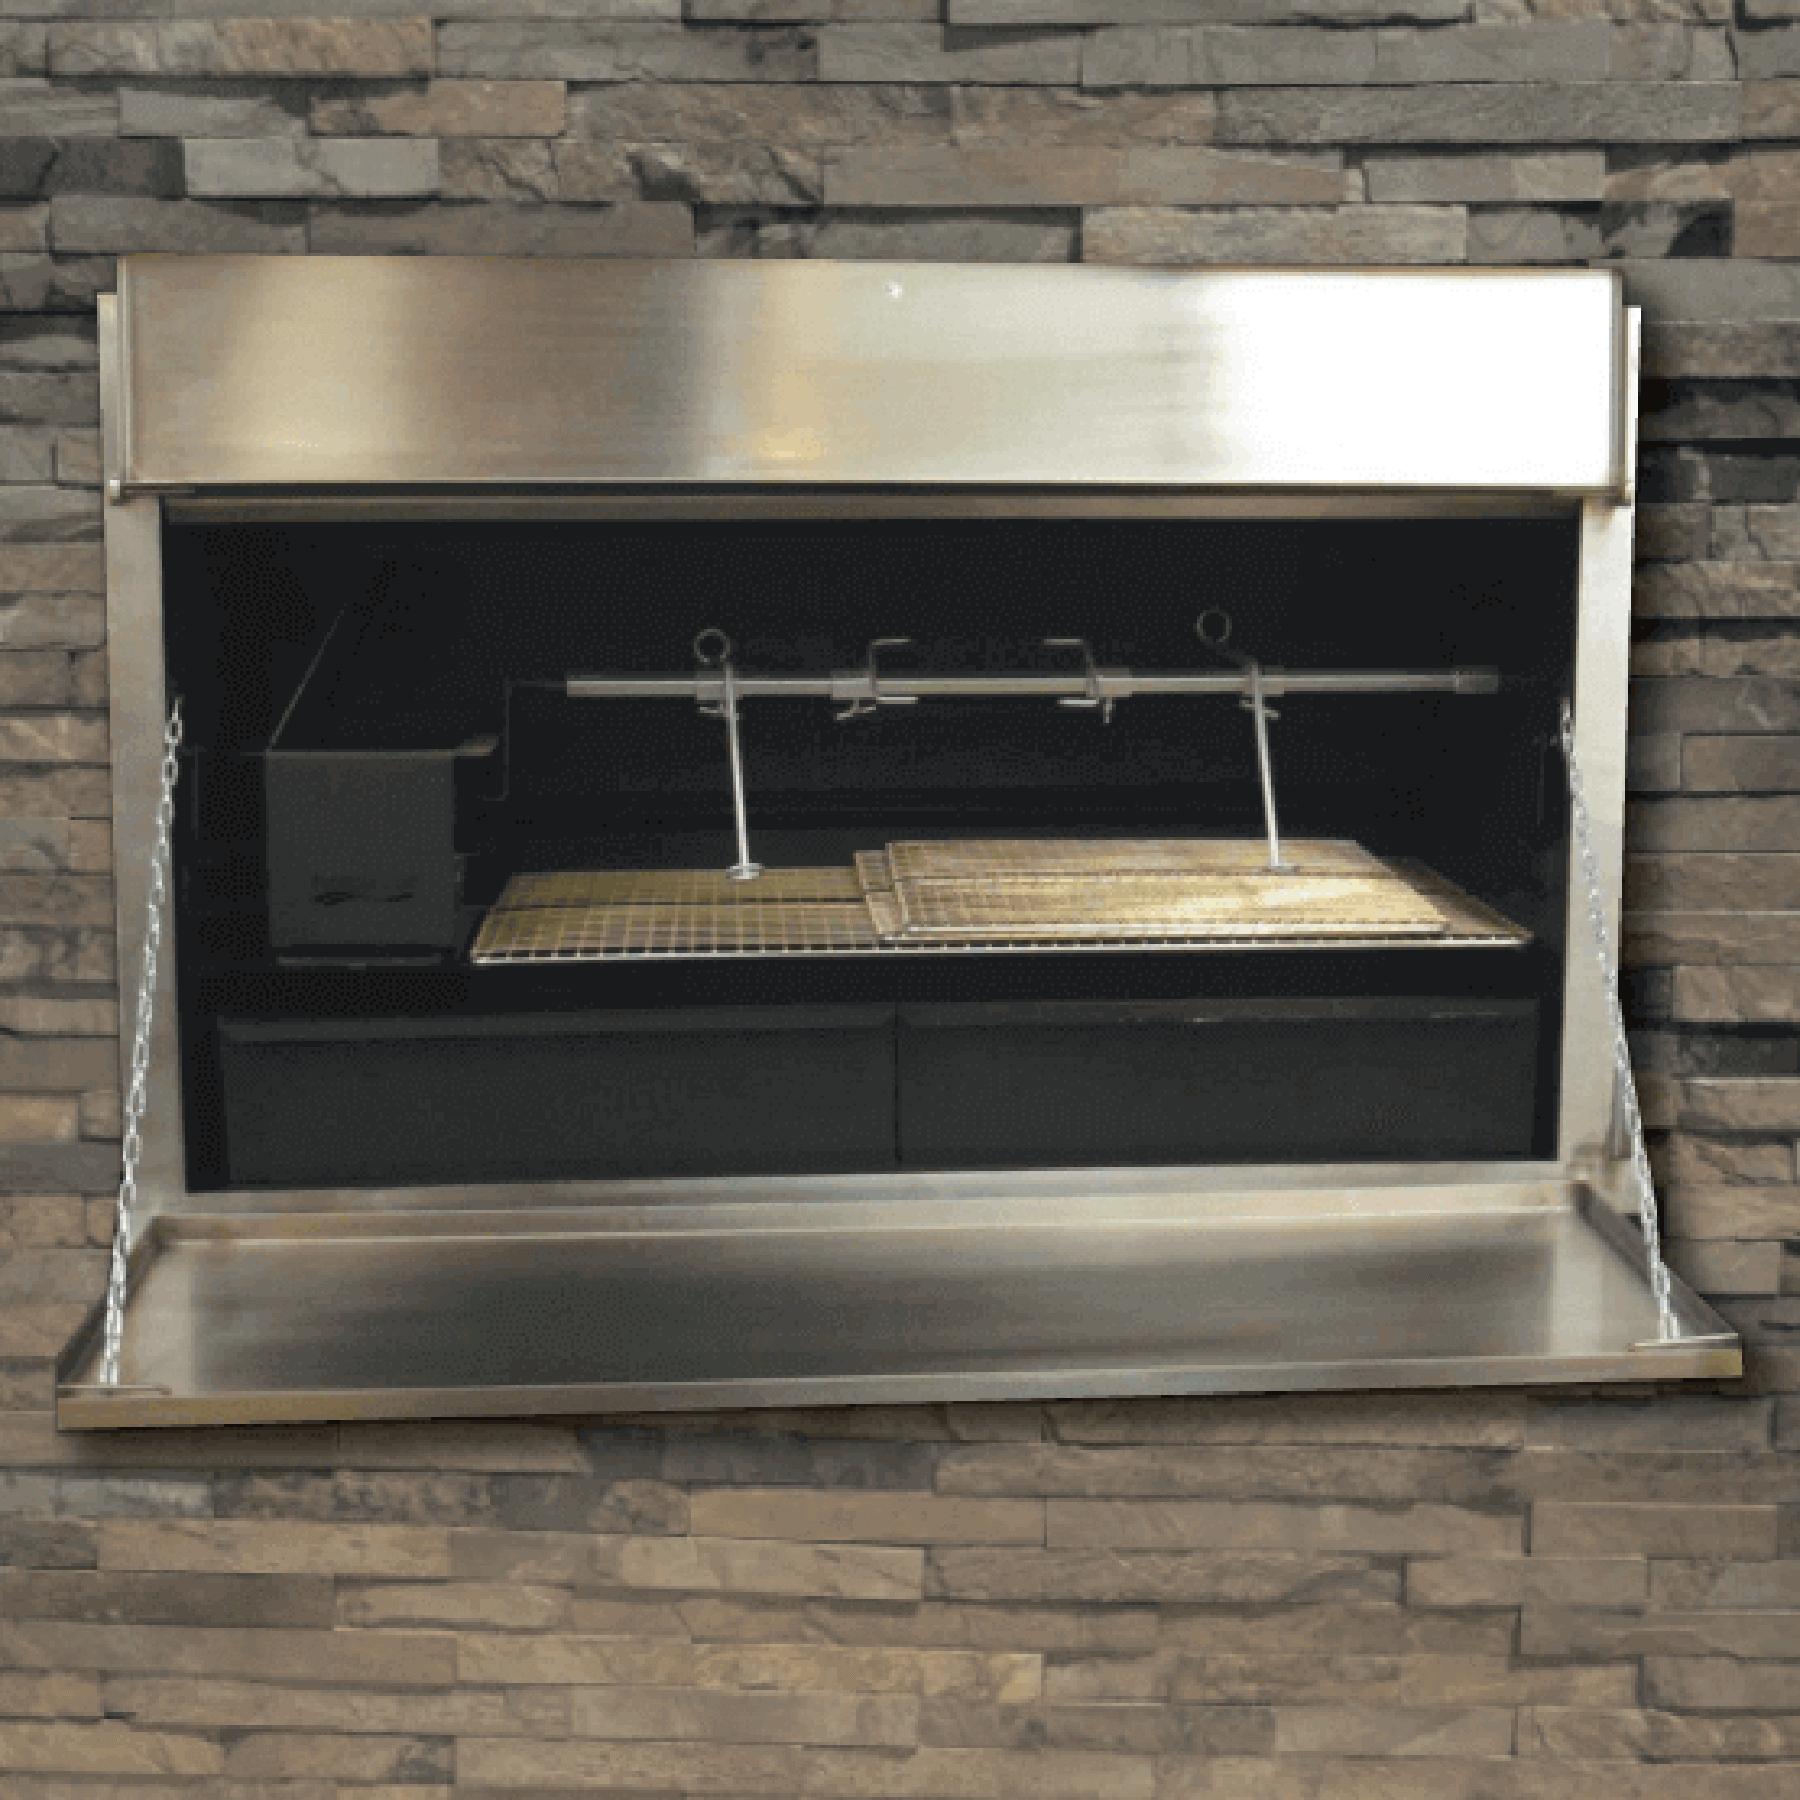 Braais-Built-In-Super-Spit-De-Lux-Stainless-Steel